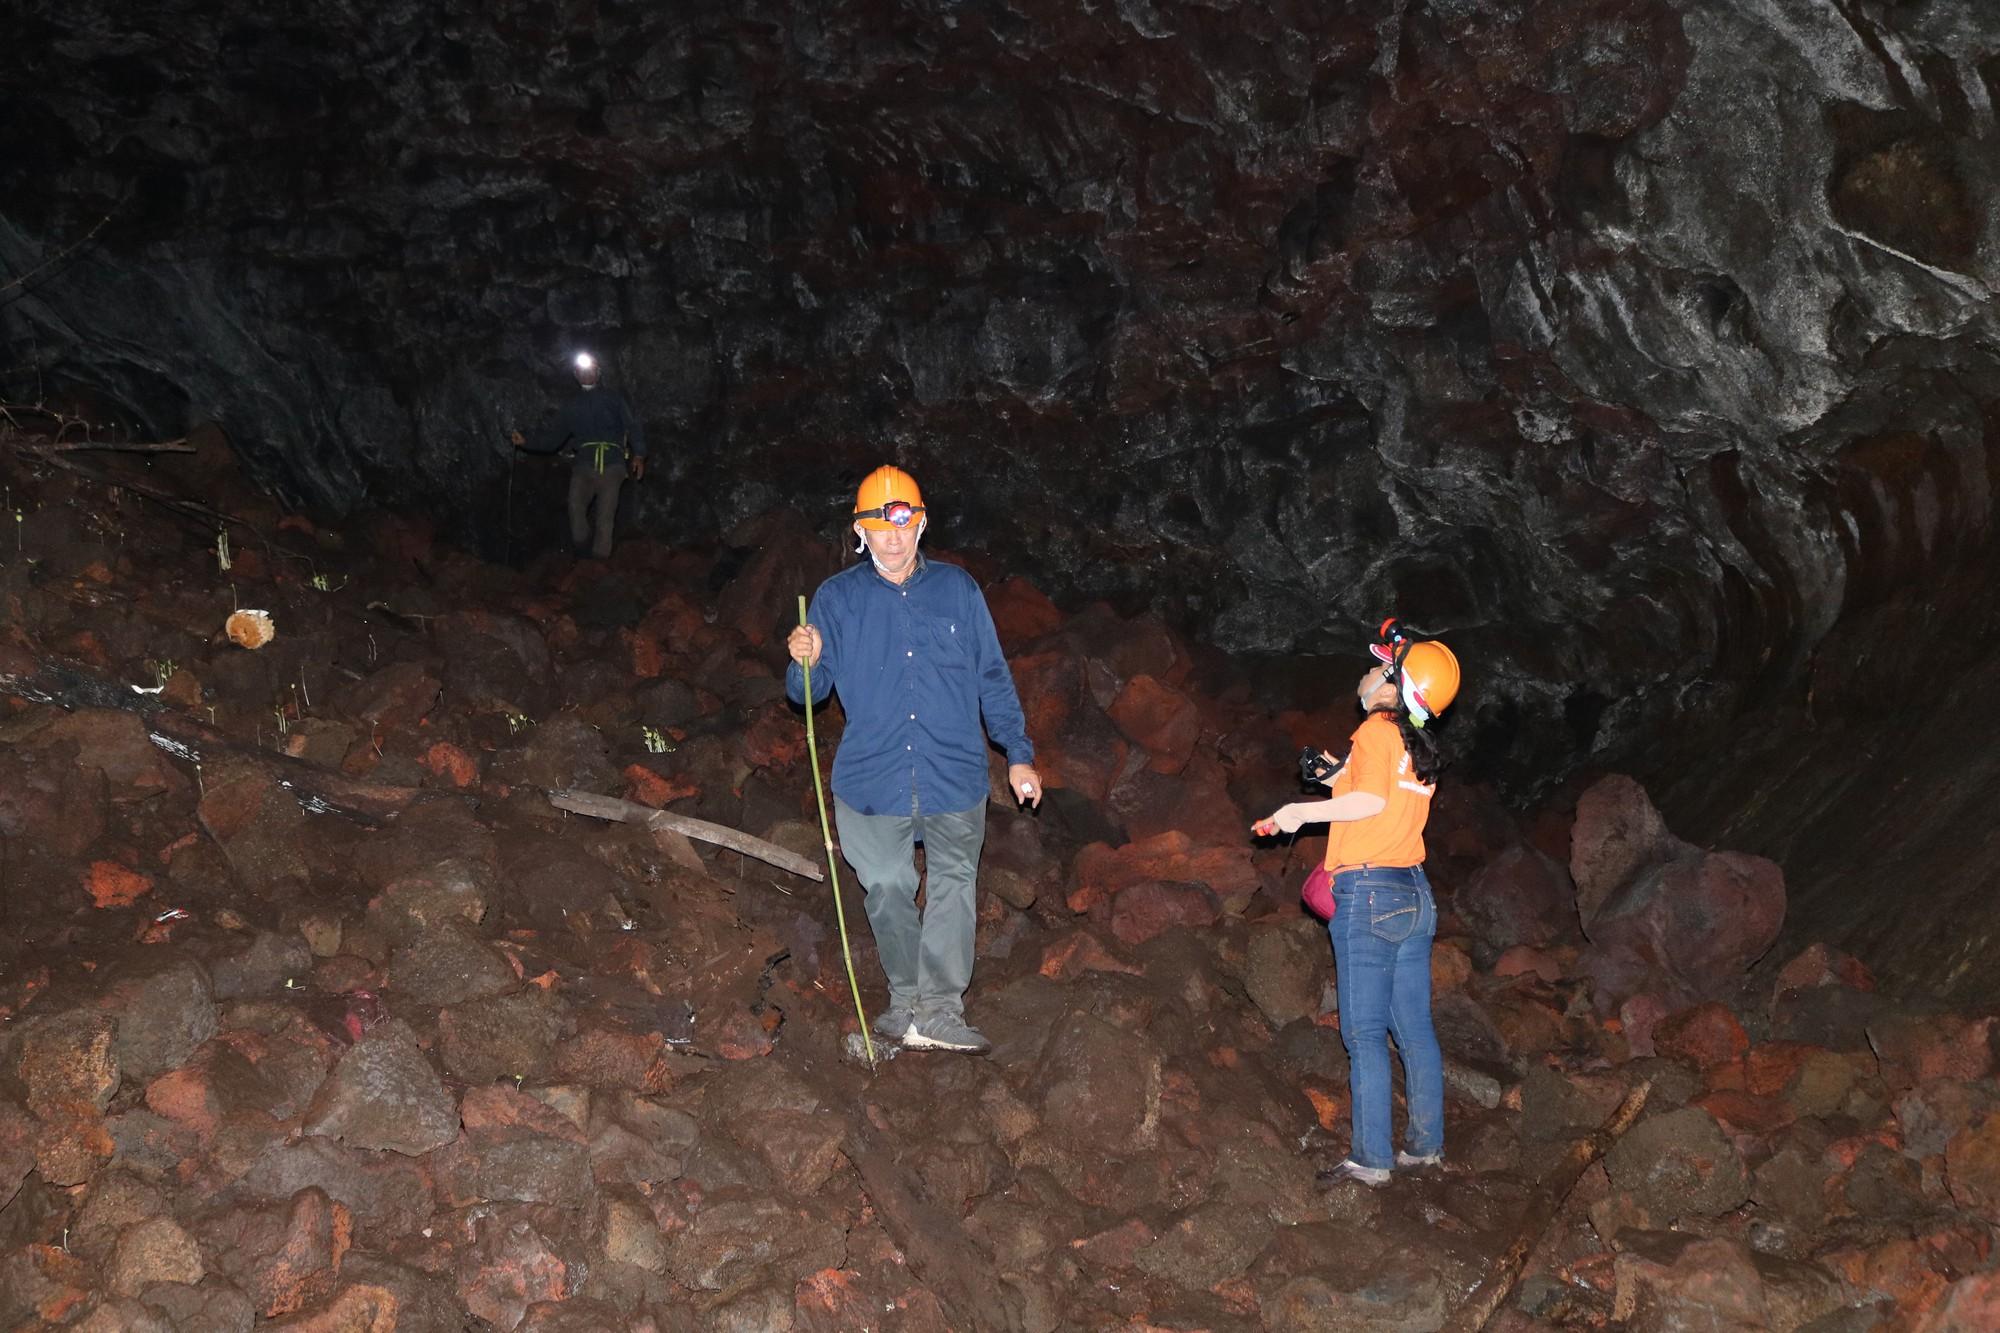 The inside of the C8 lava cave in Dak Nong Province, Vietnam's Central Highlands. Photo: Tuoi Tre